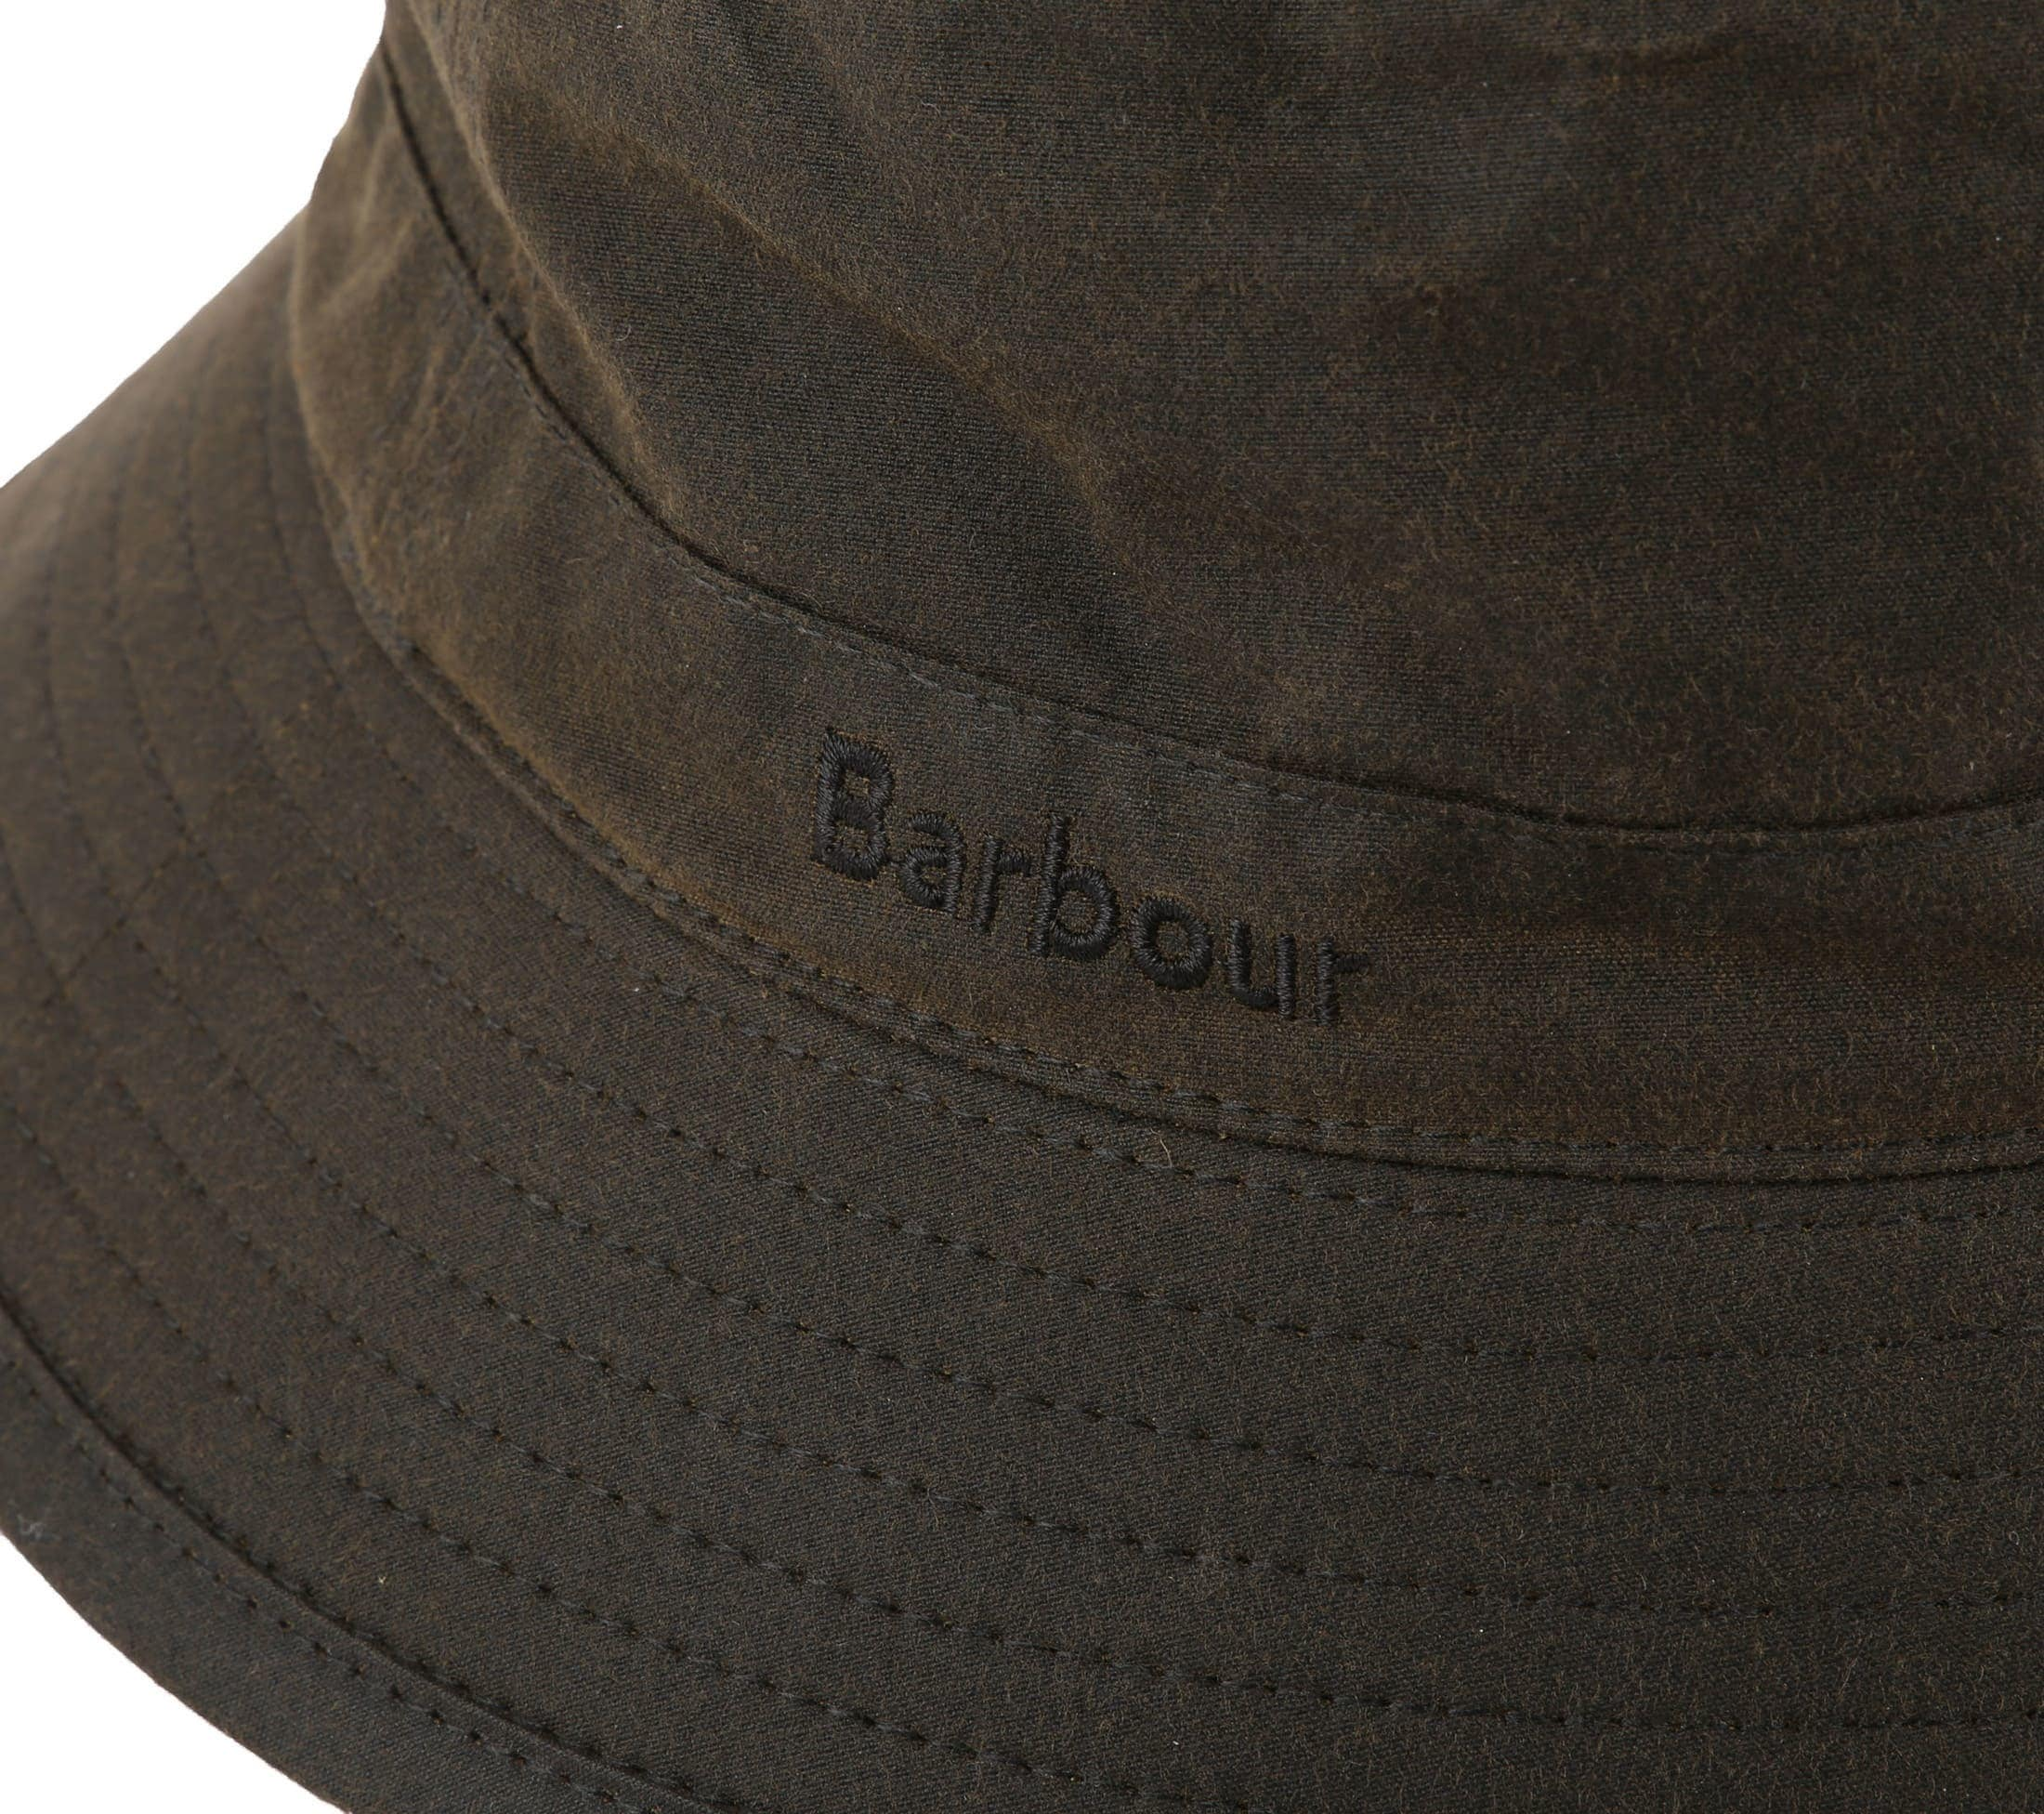 Barbour Wachshut Army